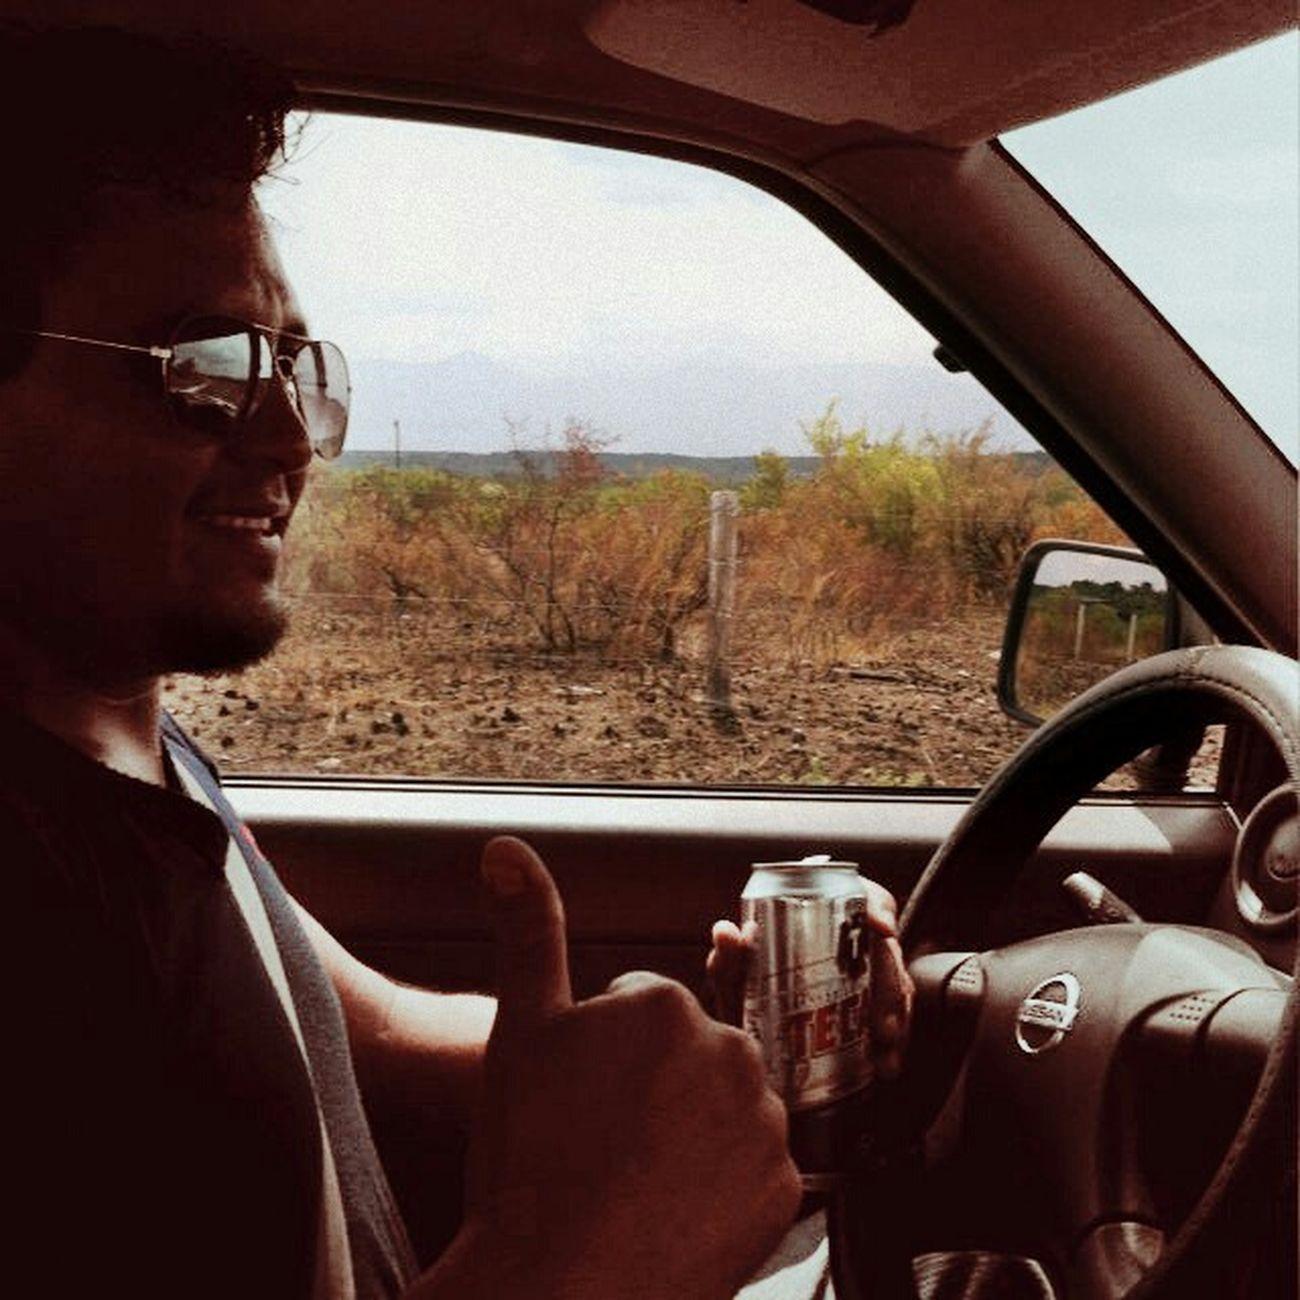 Traveling to my dreams place 😌👫❤ Recuerdos♥ 2015